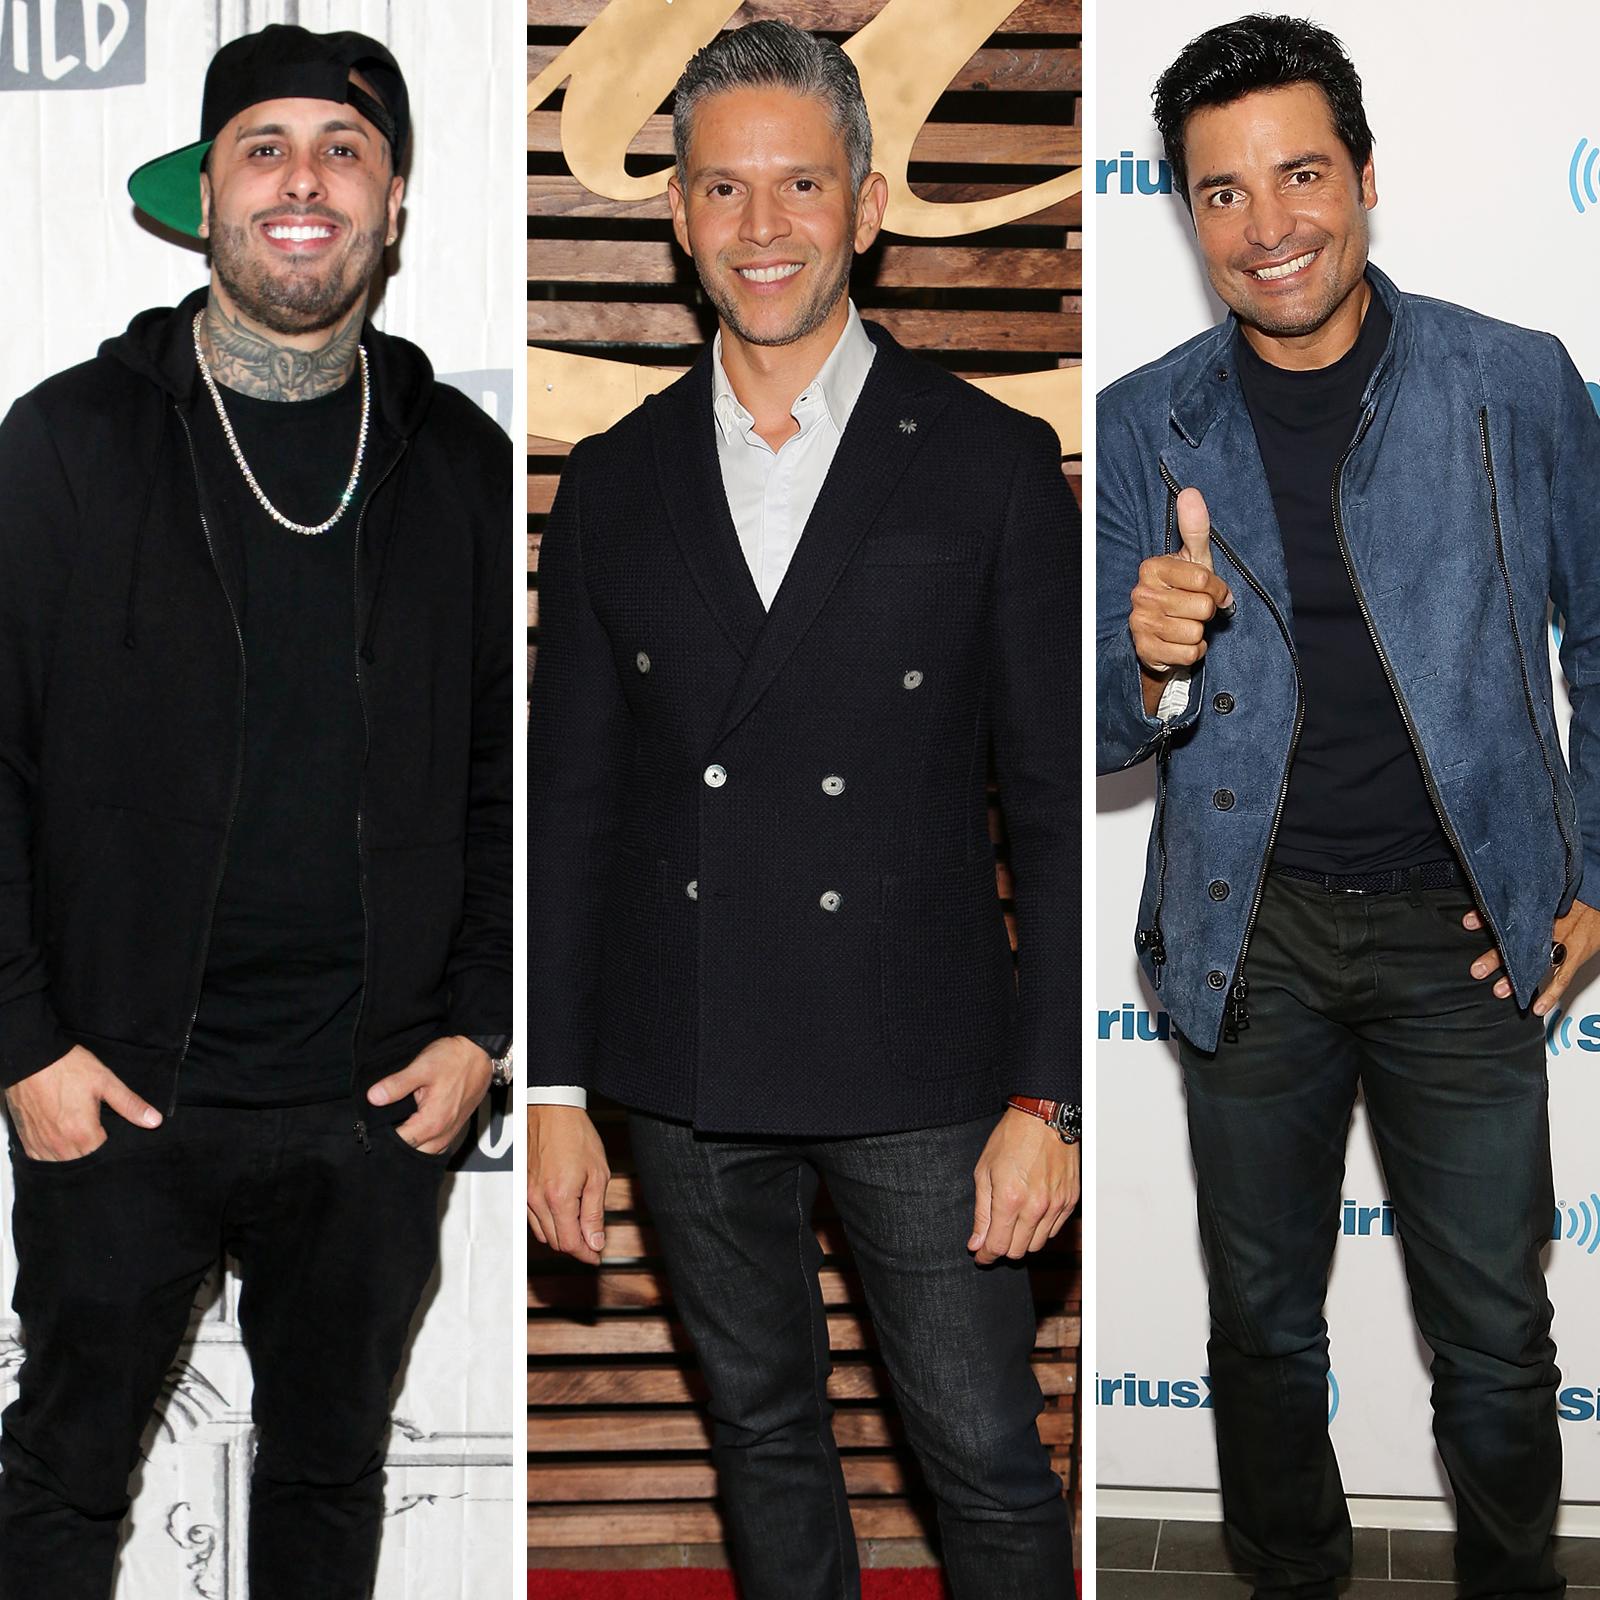 Nicky Jam, Rodner Figueroa y Chayanne